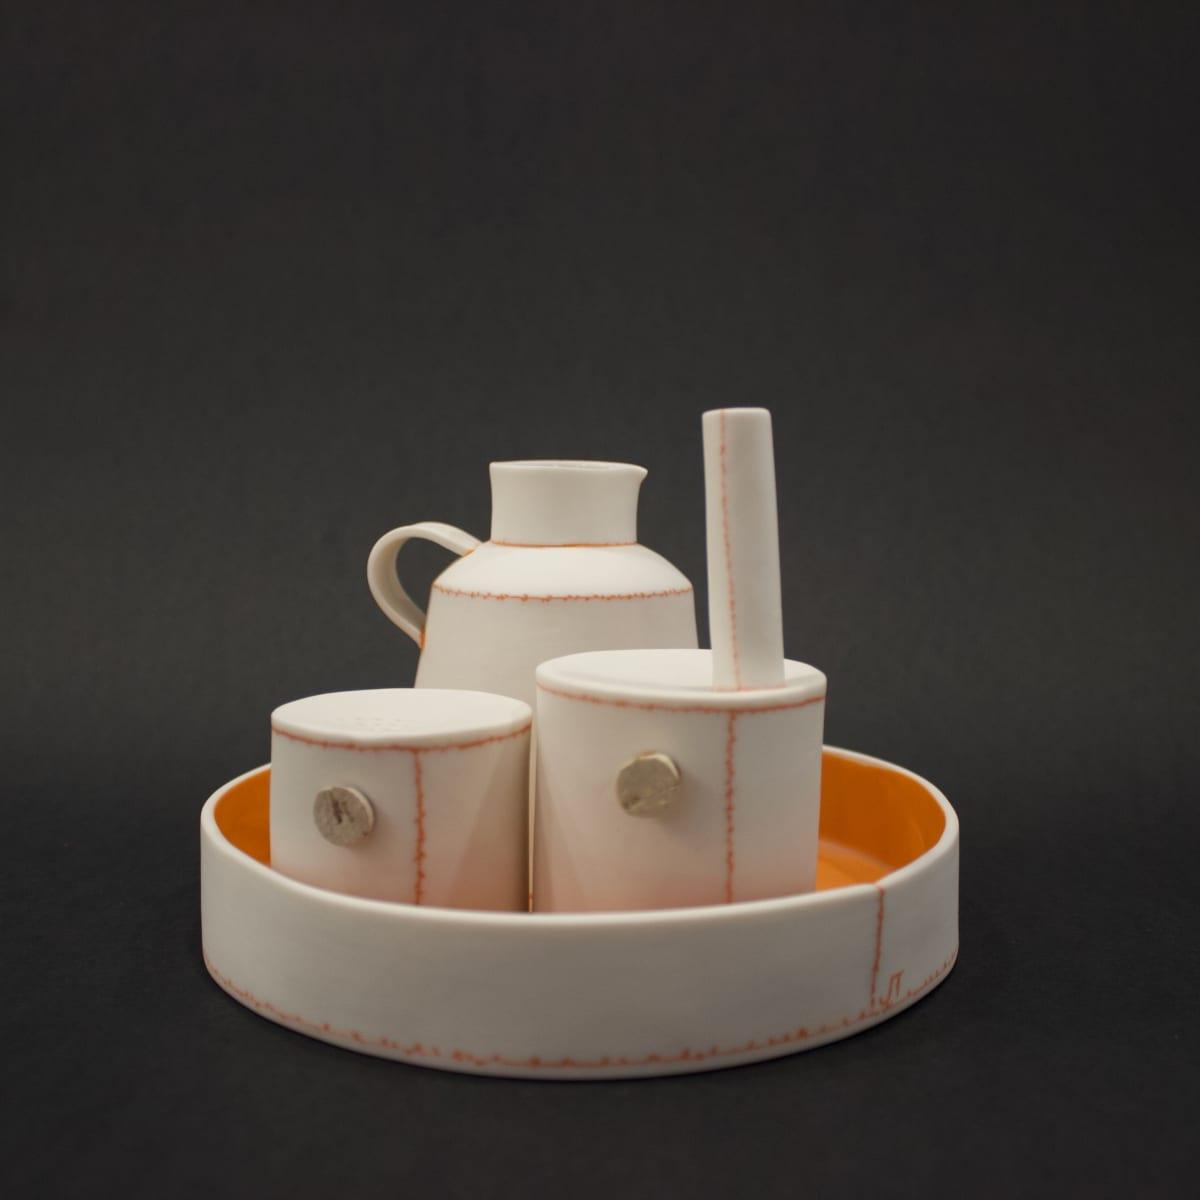 Jessica Thorn Breakfast Condiment Set, Orange, 2019 Porcelain 11 x 16 x 16 cm 4 3/8 x 6 1/4 x 6 1/4 in